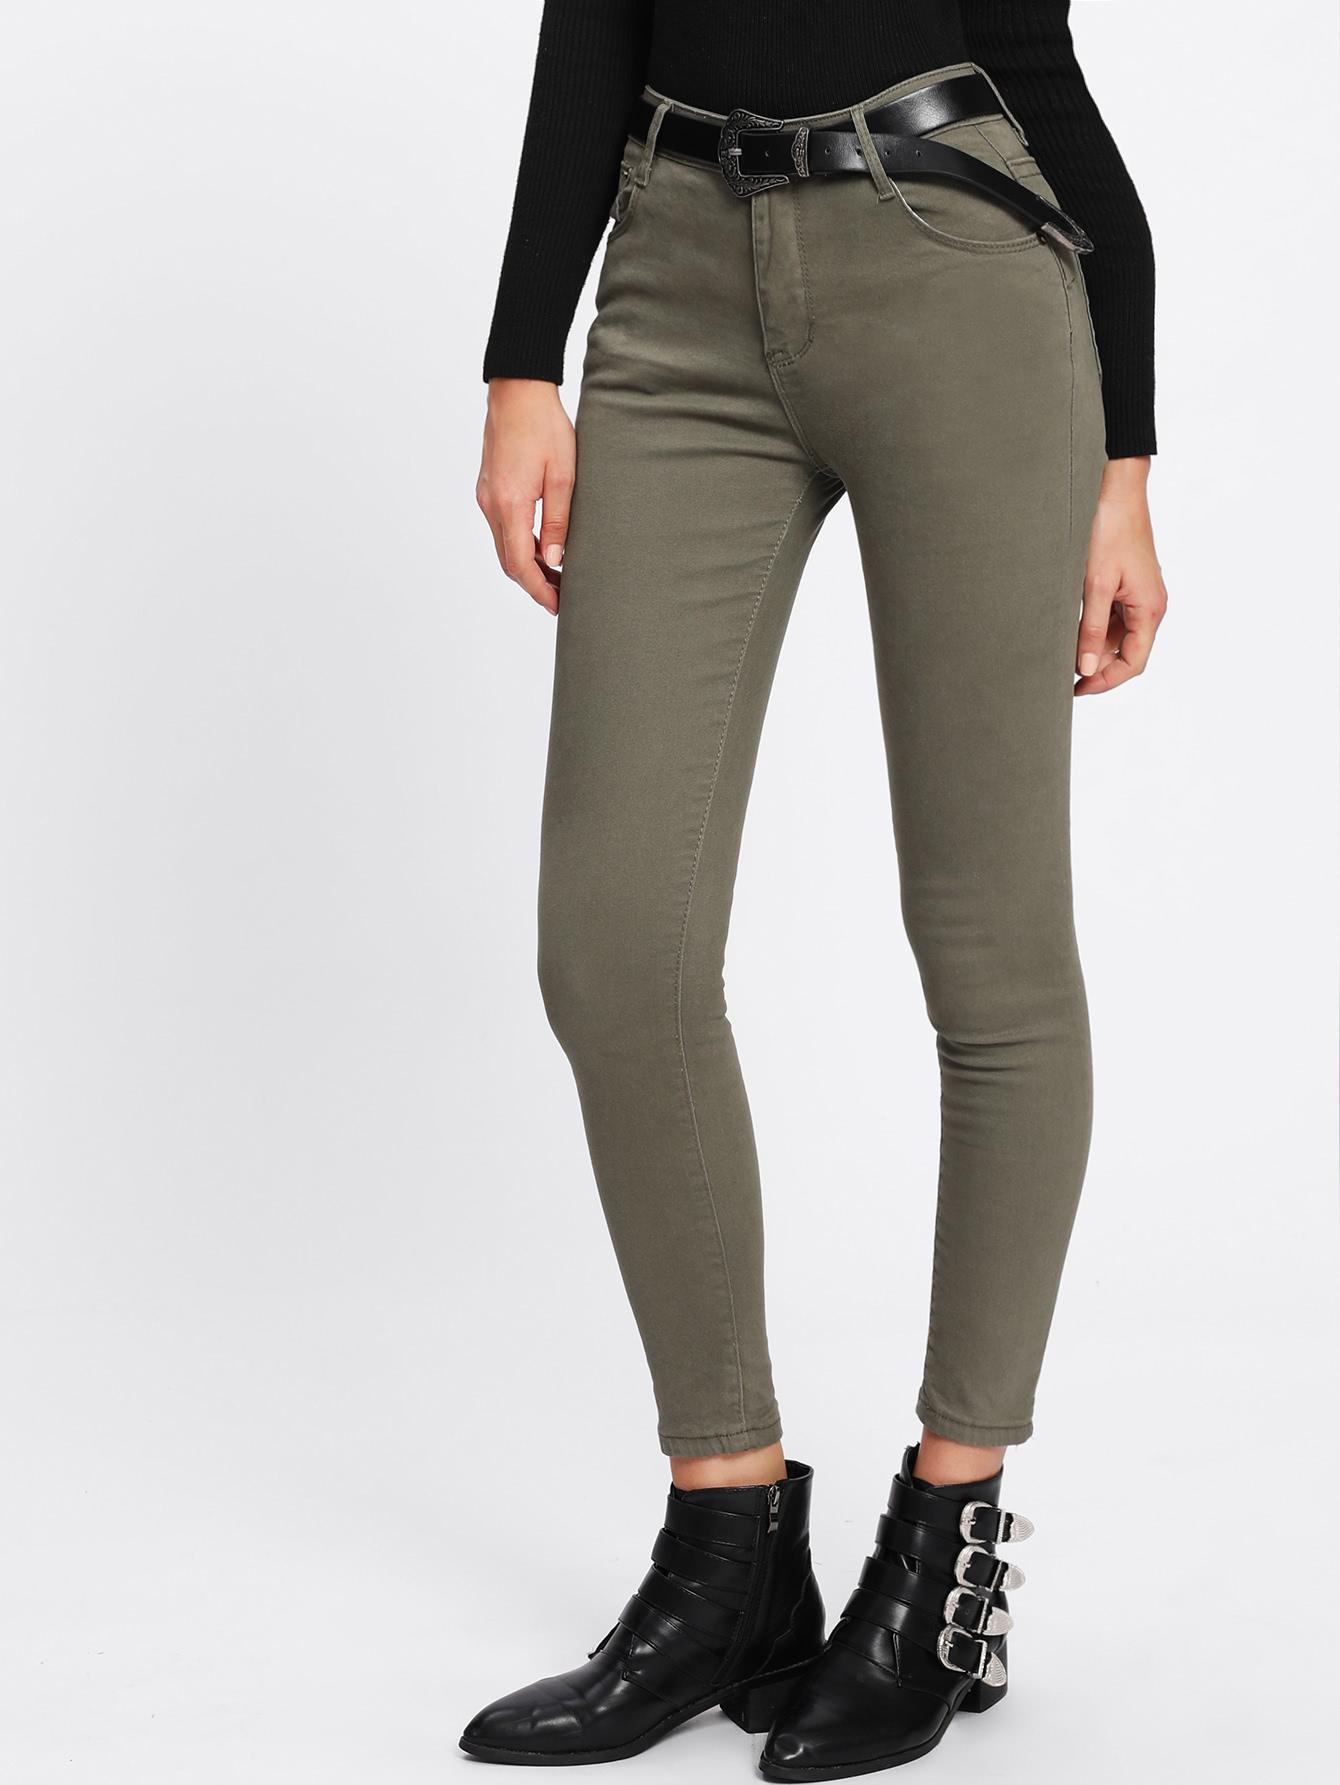 Skinny Ankle Jeans джеймс эшер bhakta ranga rasa india новый взгляд mp3